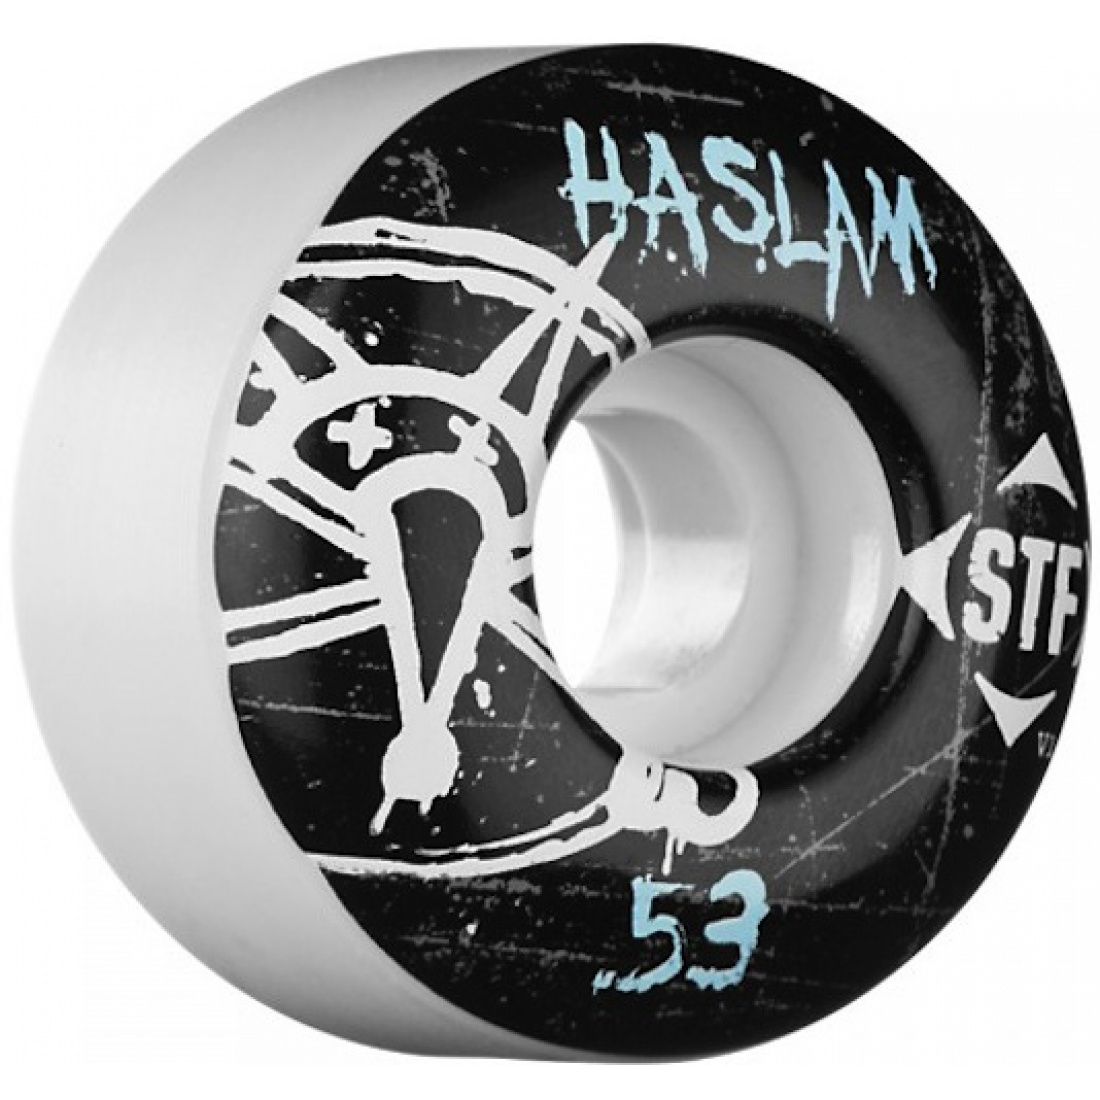 Bones Haslam Oh Gee Streettech 53MM Wheels (Set of 4) (Set of 4)